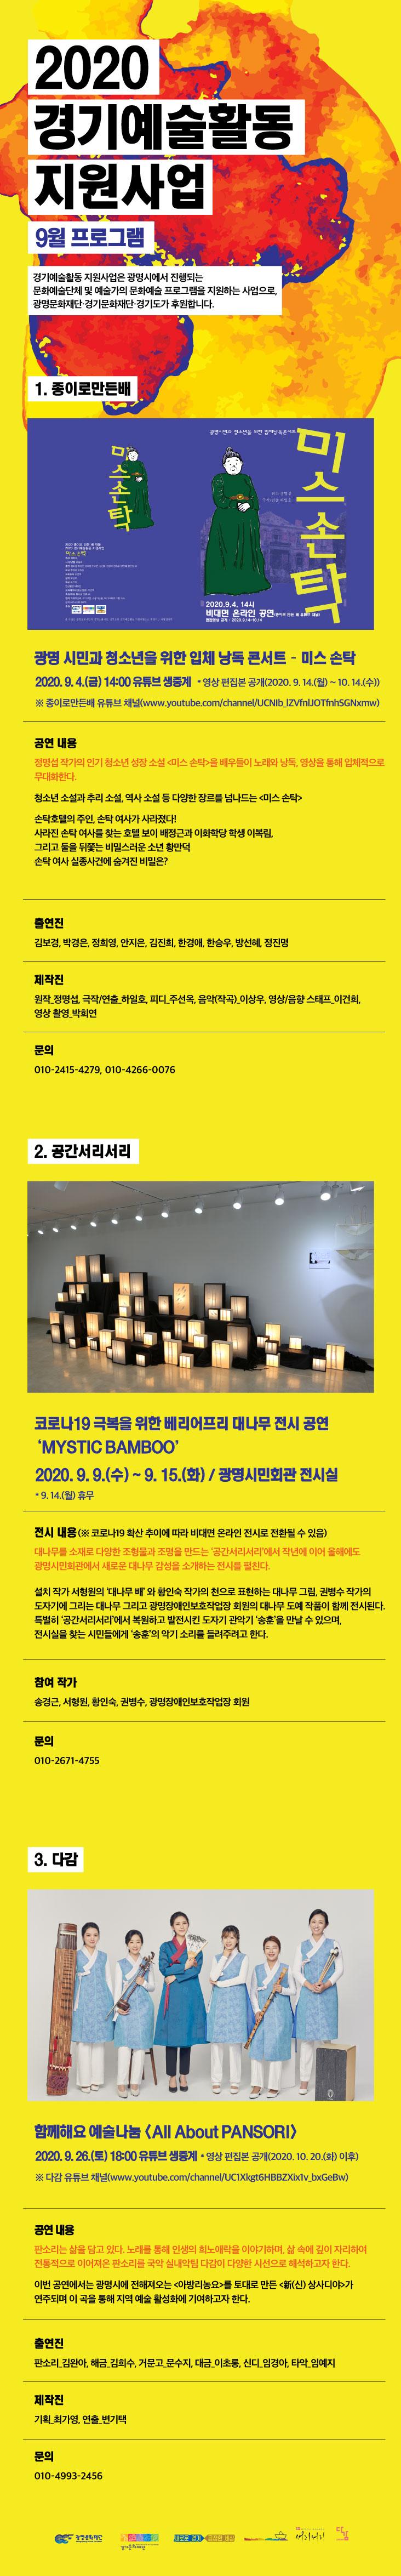 20200903_web_9월_수정_1.jpg